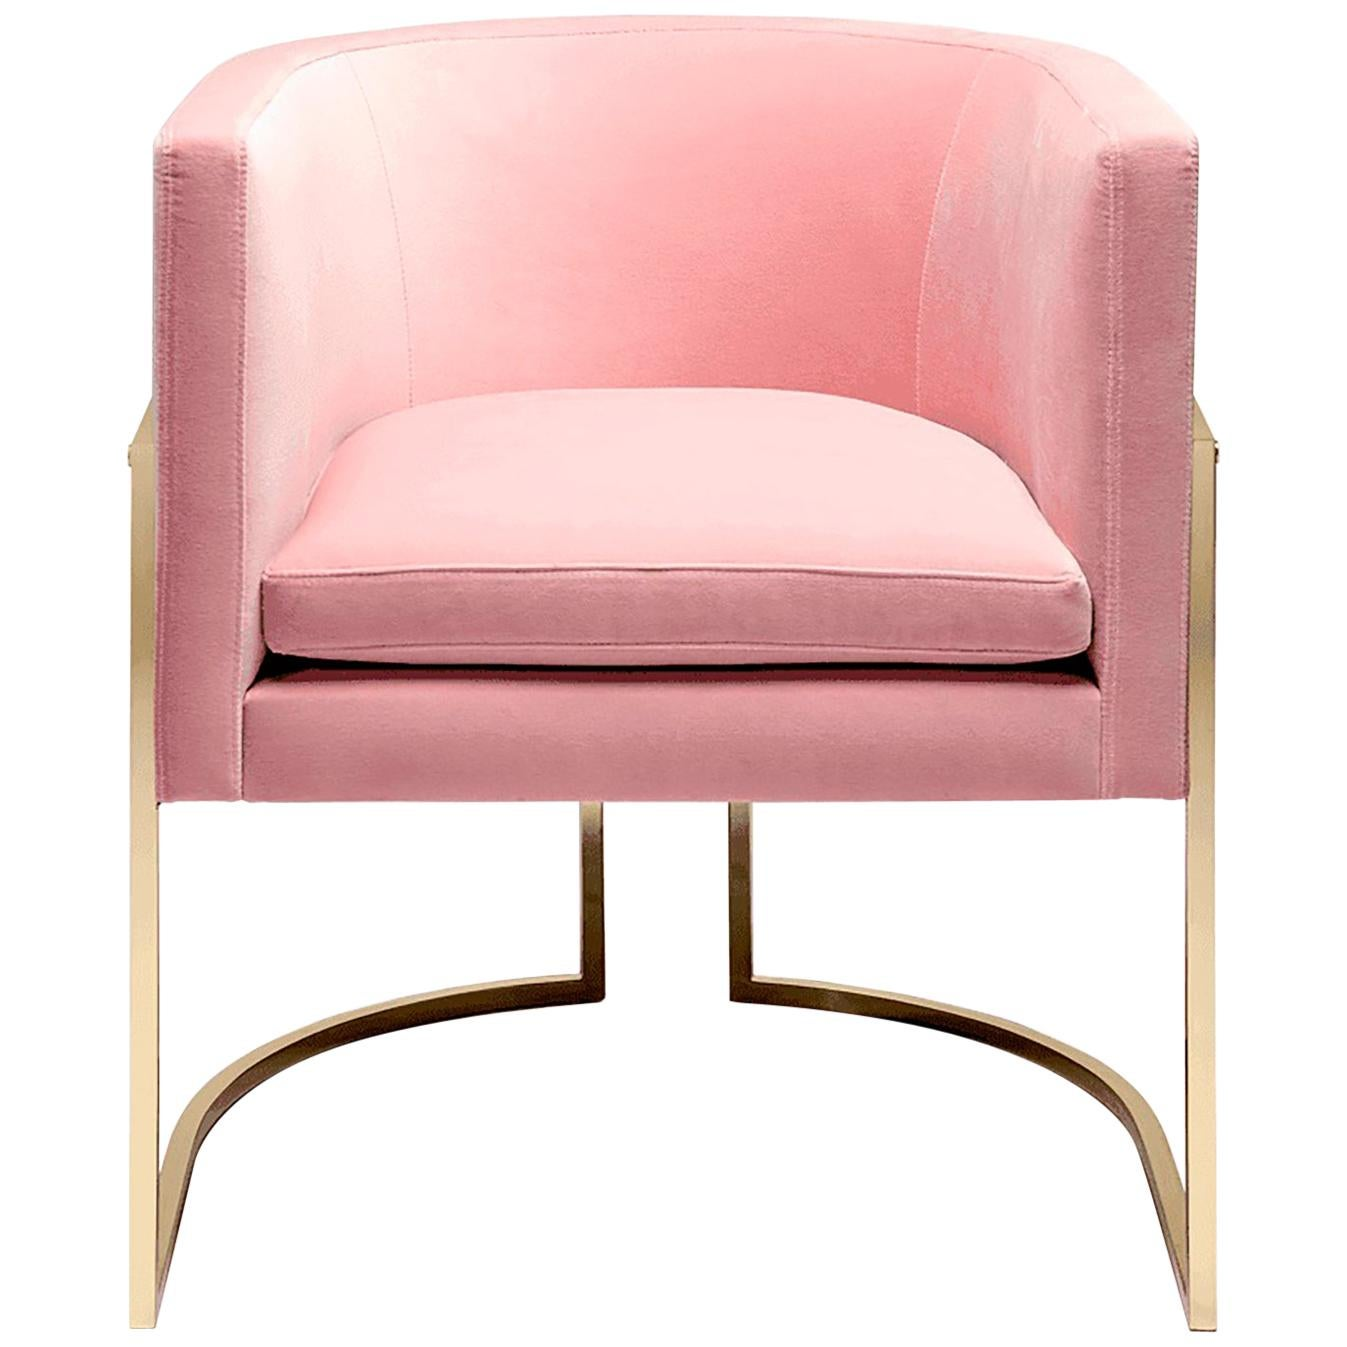 Luxury Beverly Hills Art Deco Contemporary Velvet Upholstered Dining & Armchair